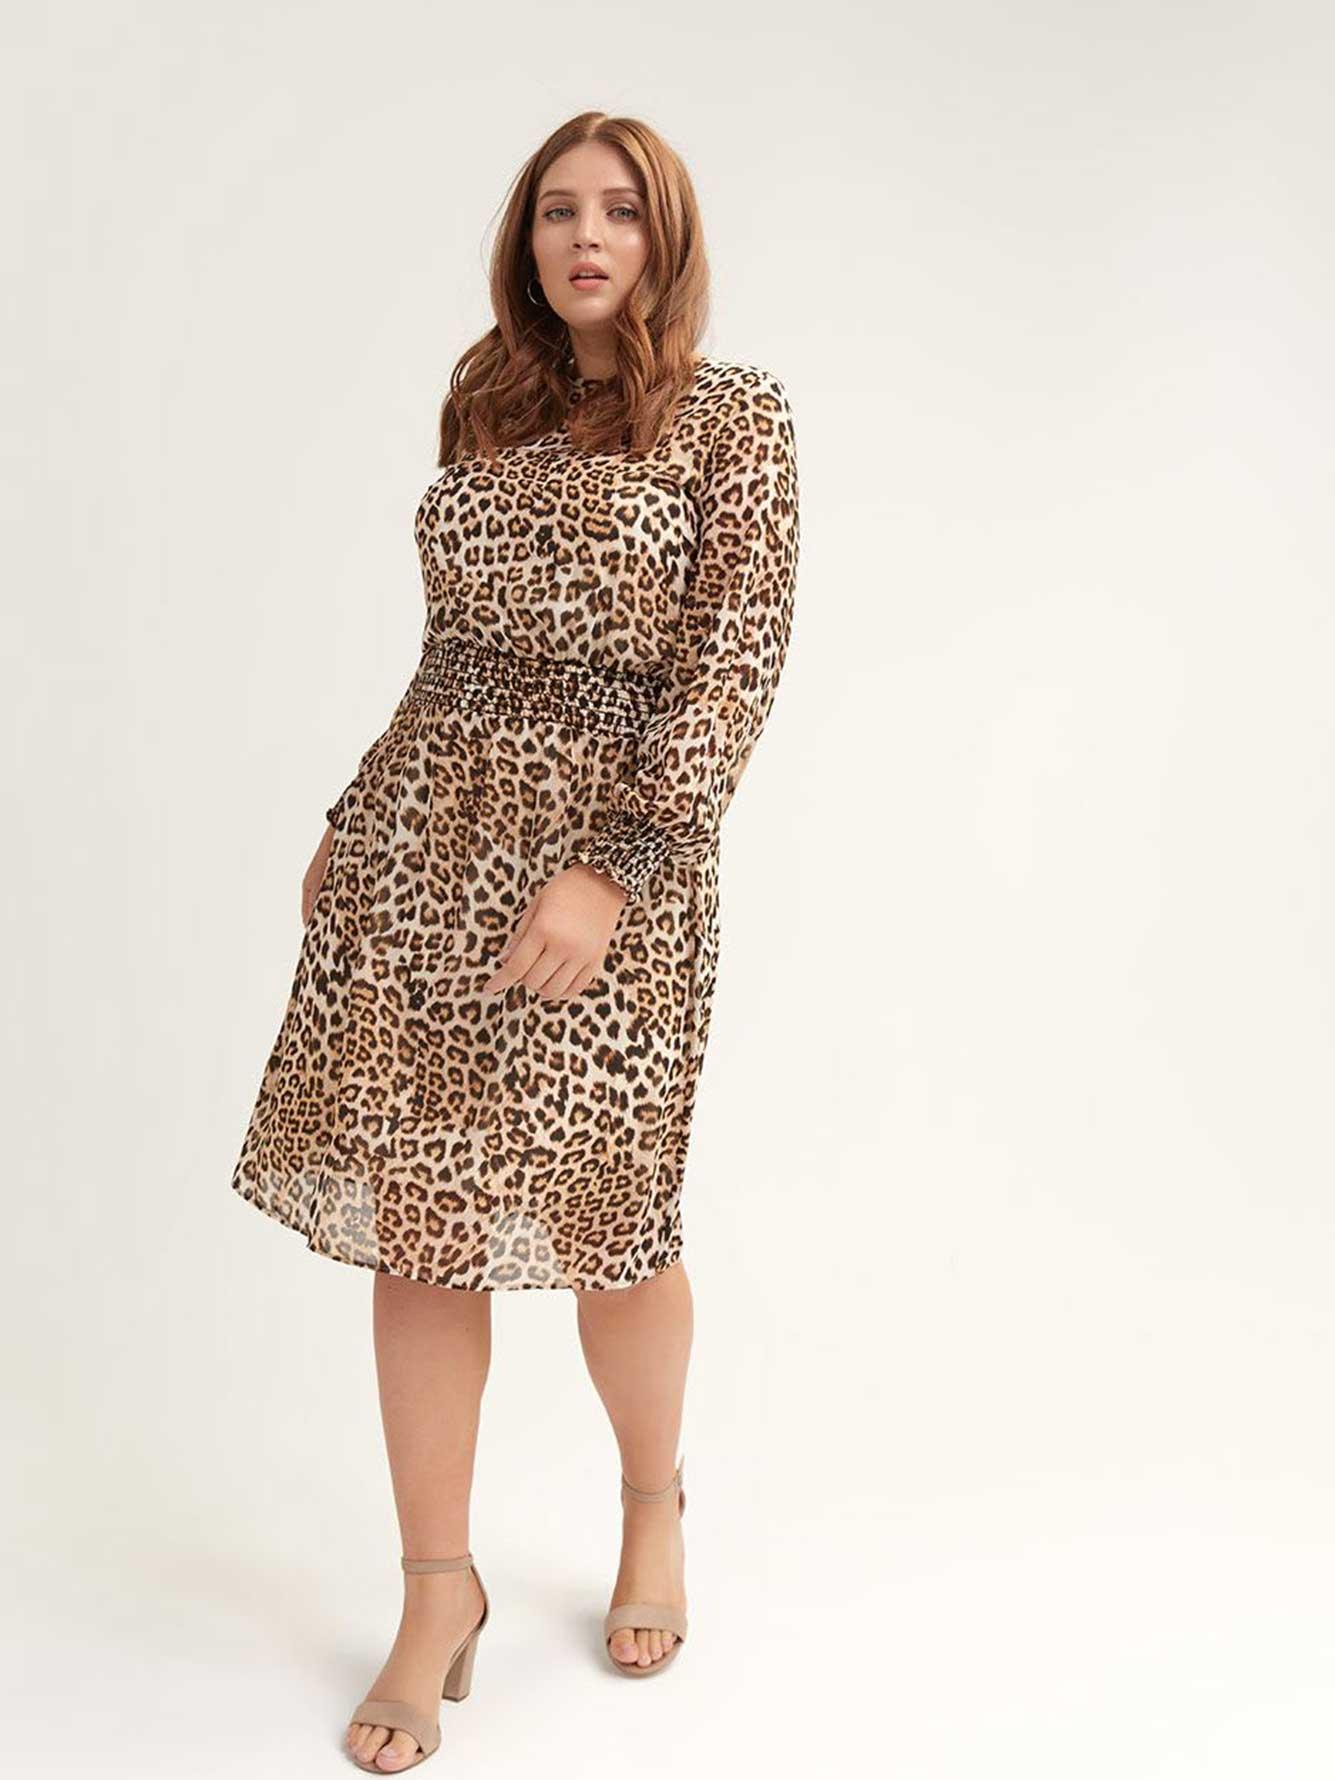 9f843889319 Leopard-Print Dress with Smocking Details | Penningtons